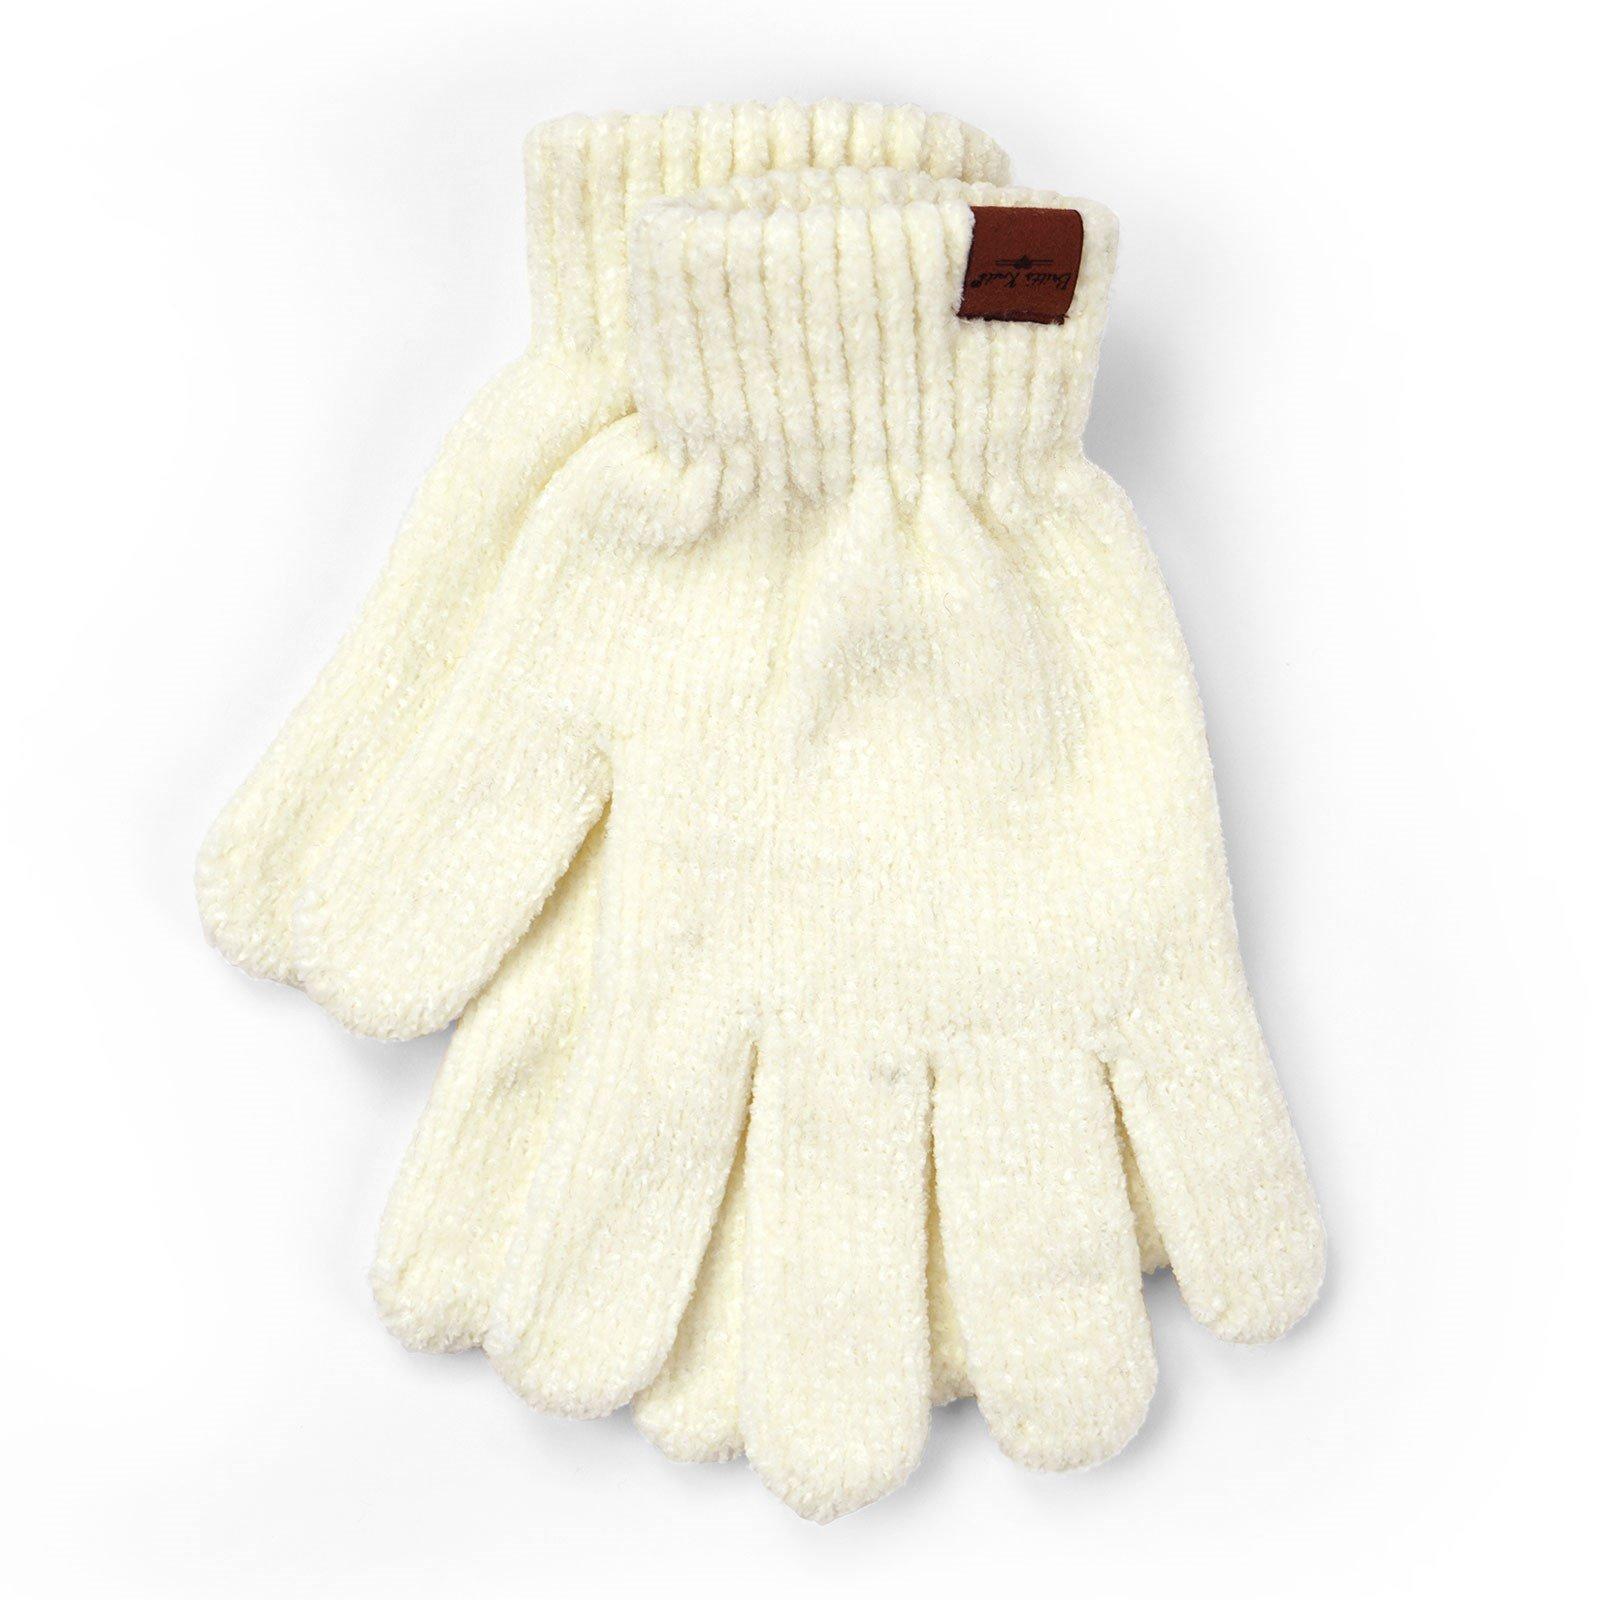 Britt's Knits Beyond Soft Chenille Gloves